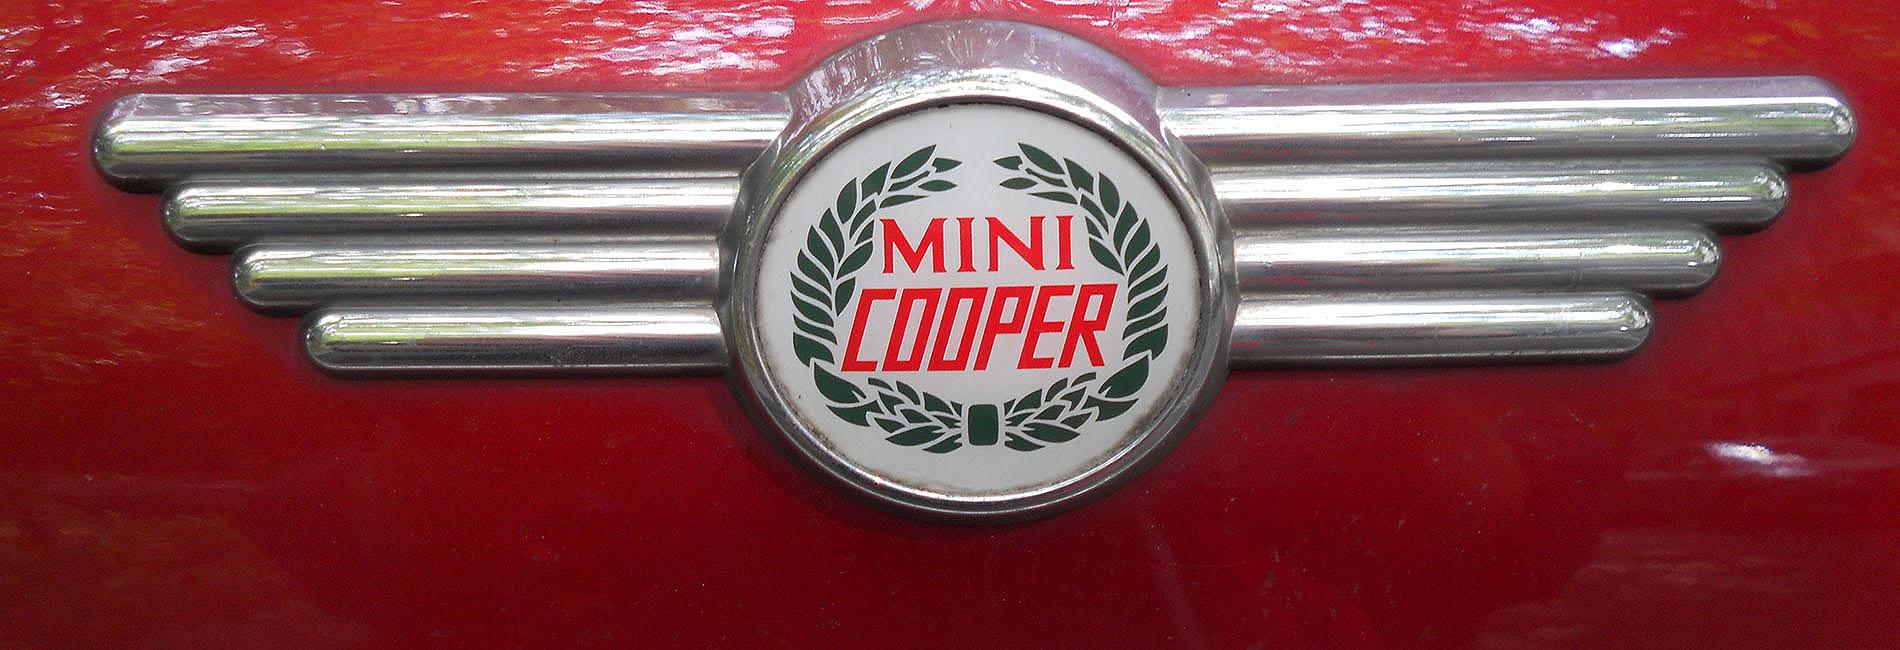 Specialist Classic Mini Garage